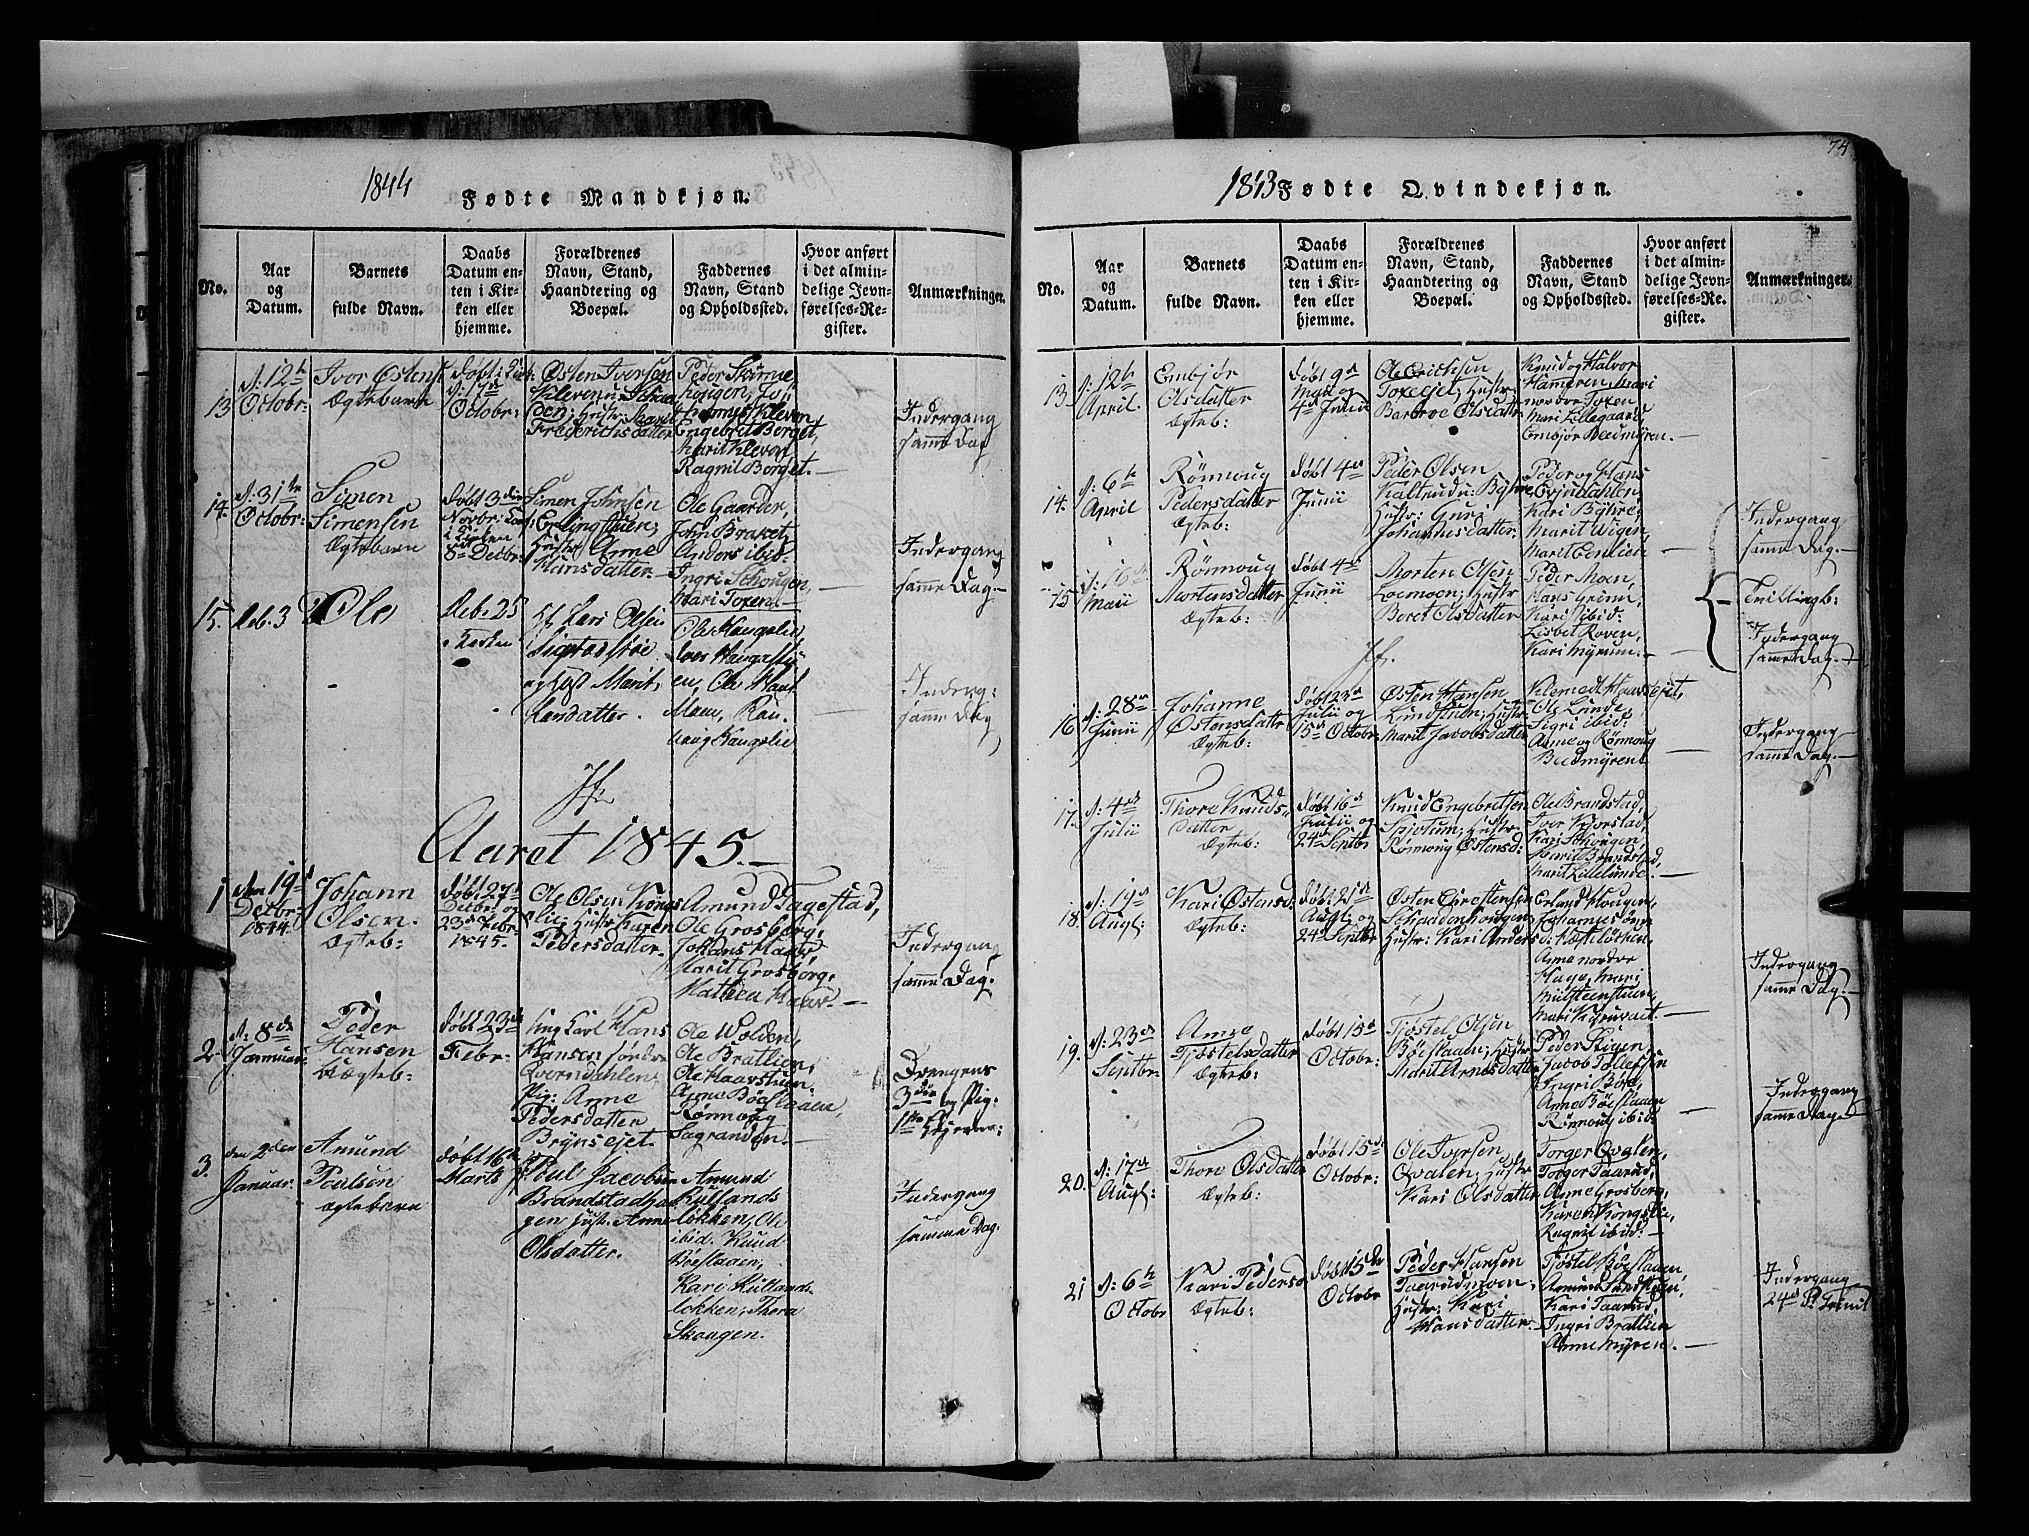 SAH, Fron prestekontor, H/Ha/Hab/L0004: Klokkerbok nr. 4, 1816-1850, s. 74